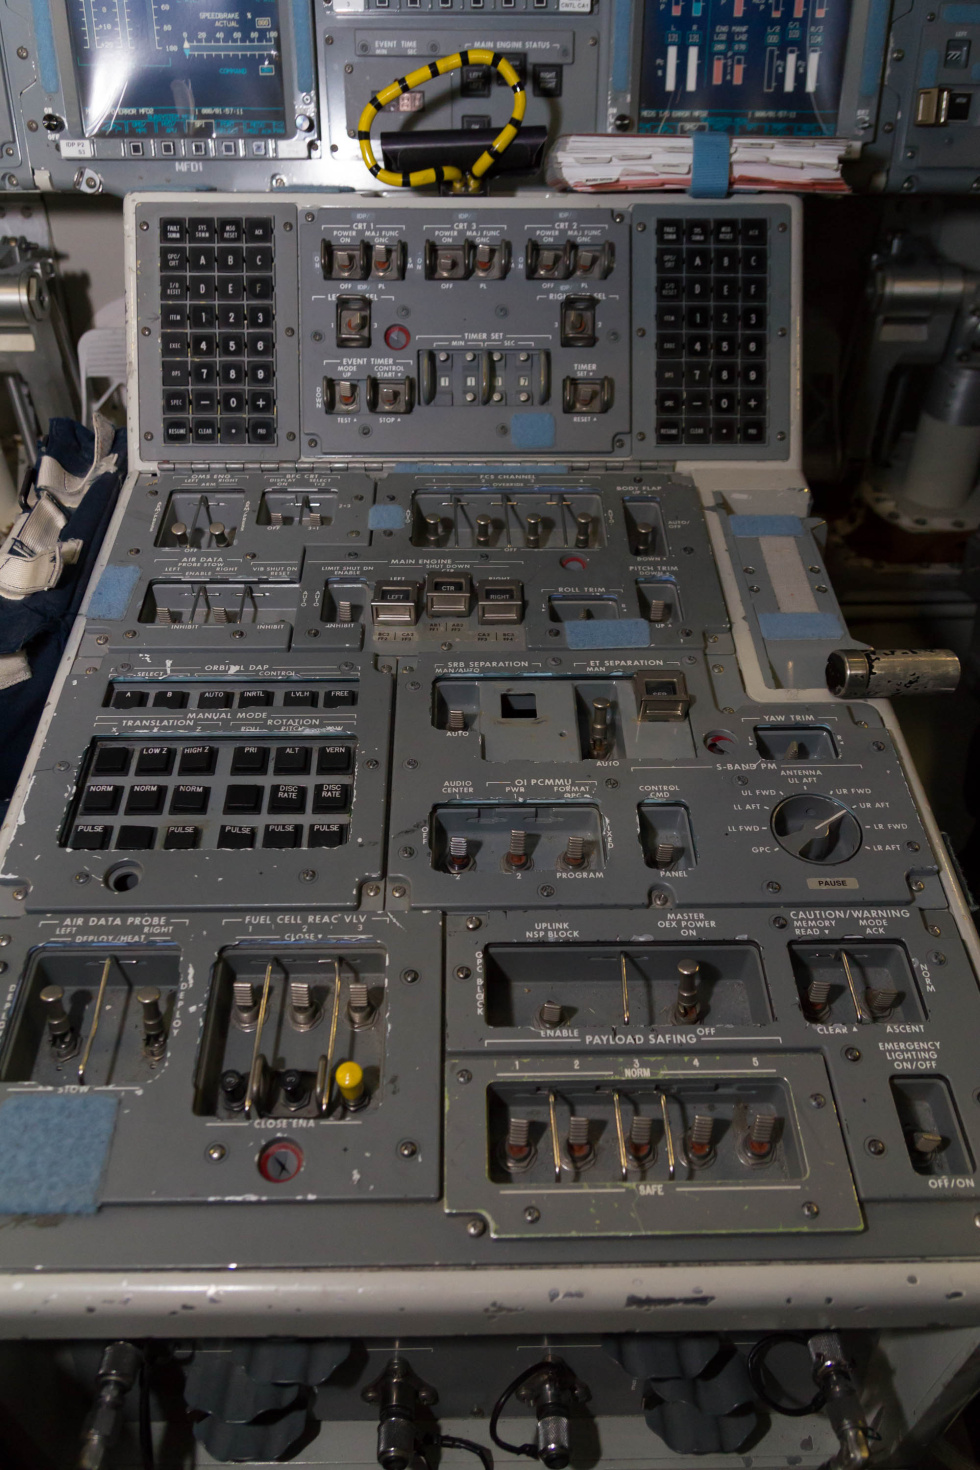 space shuttle cockpit trainer - photo #28